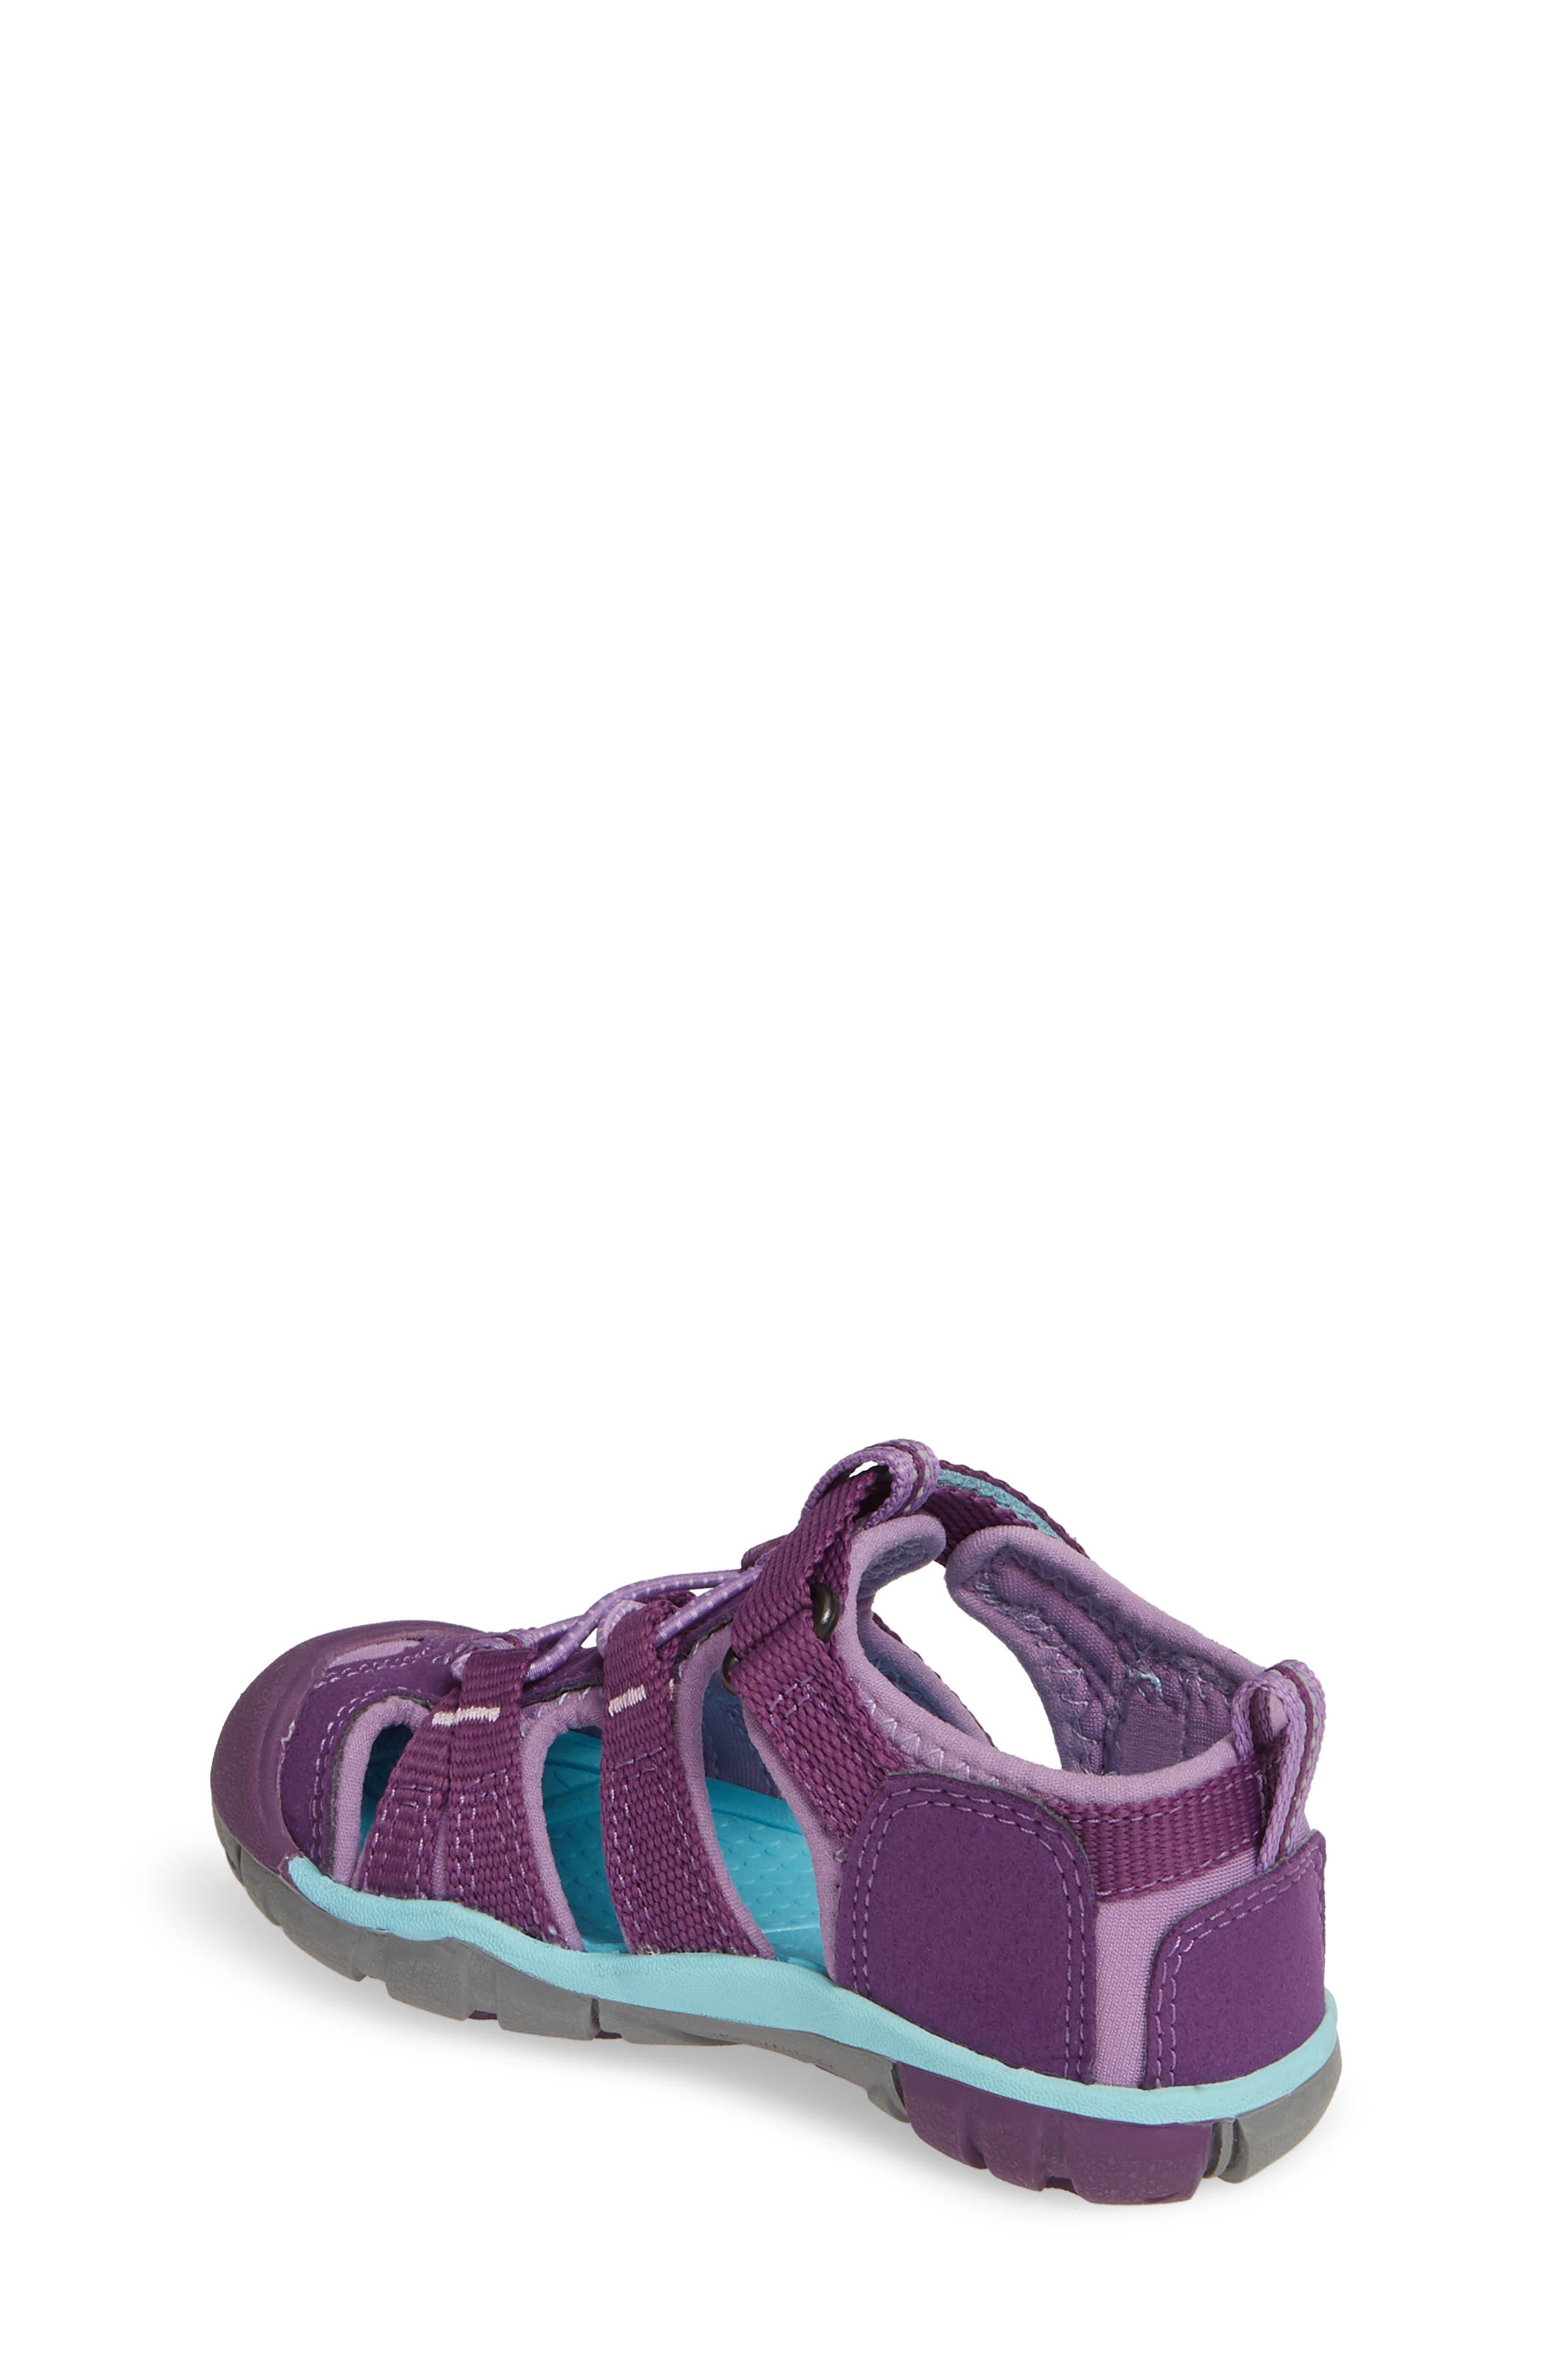 ,                             'Seacamp II' Water Friendly Sandal,                             Alternate thumbnail 59, color,                             509